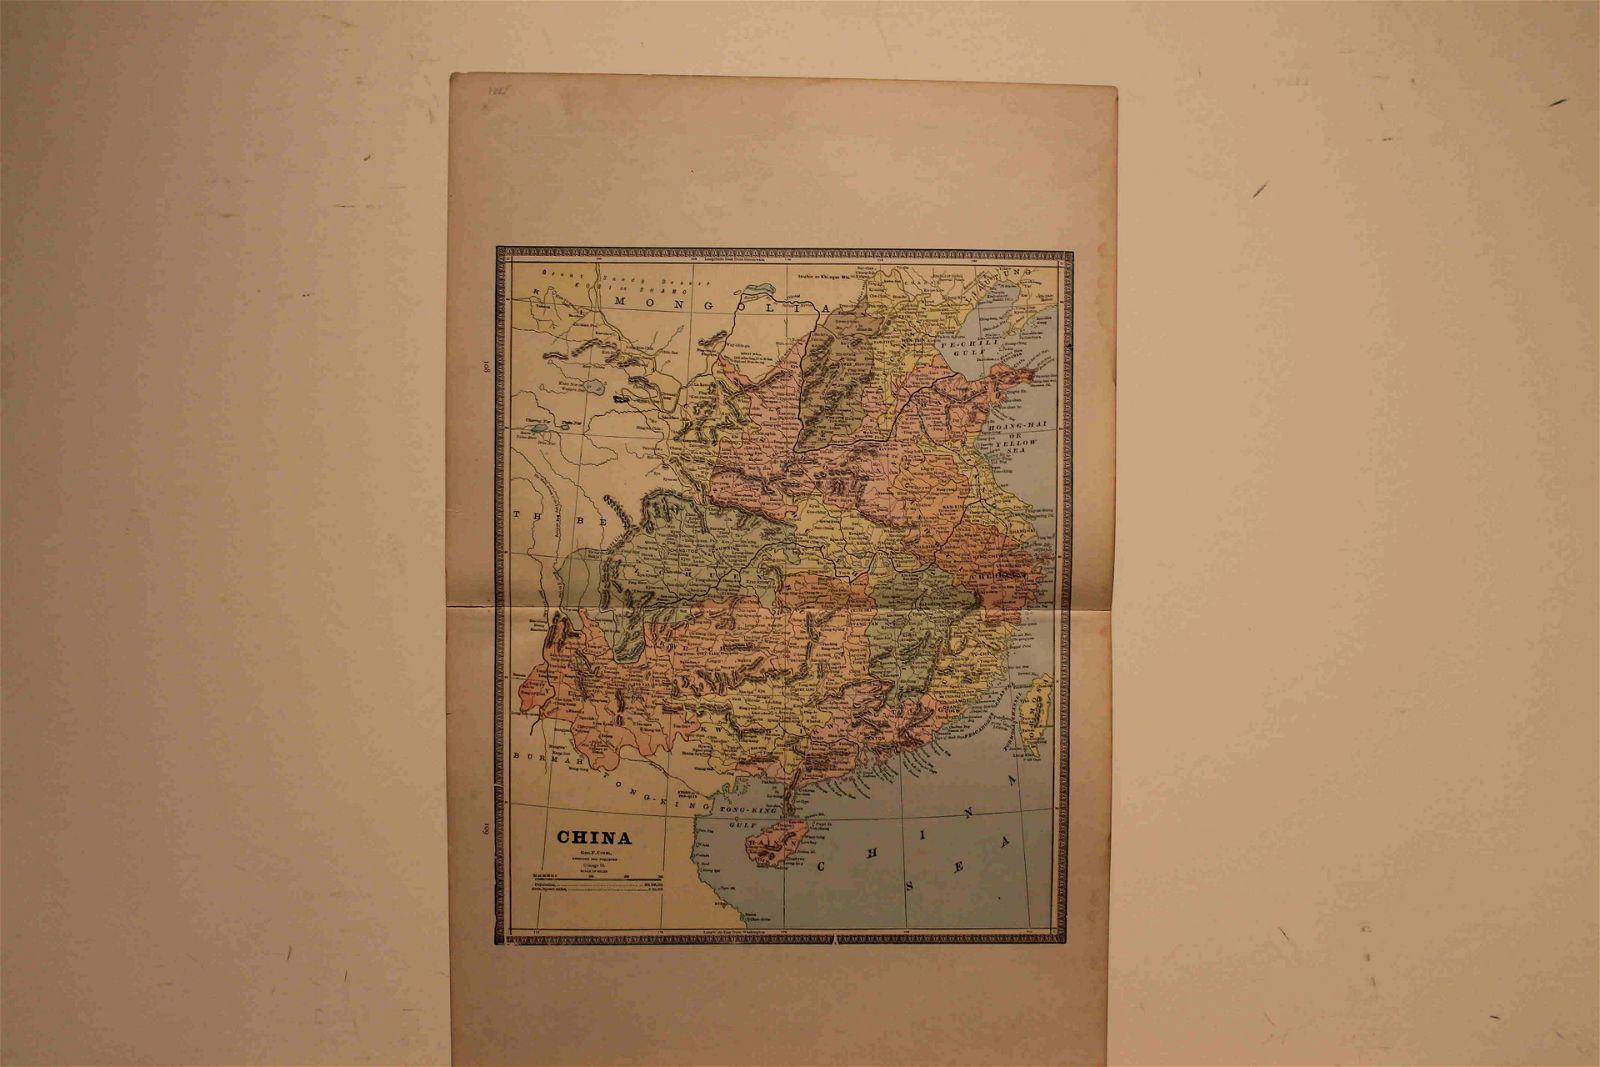 1885 Map of China